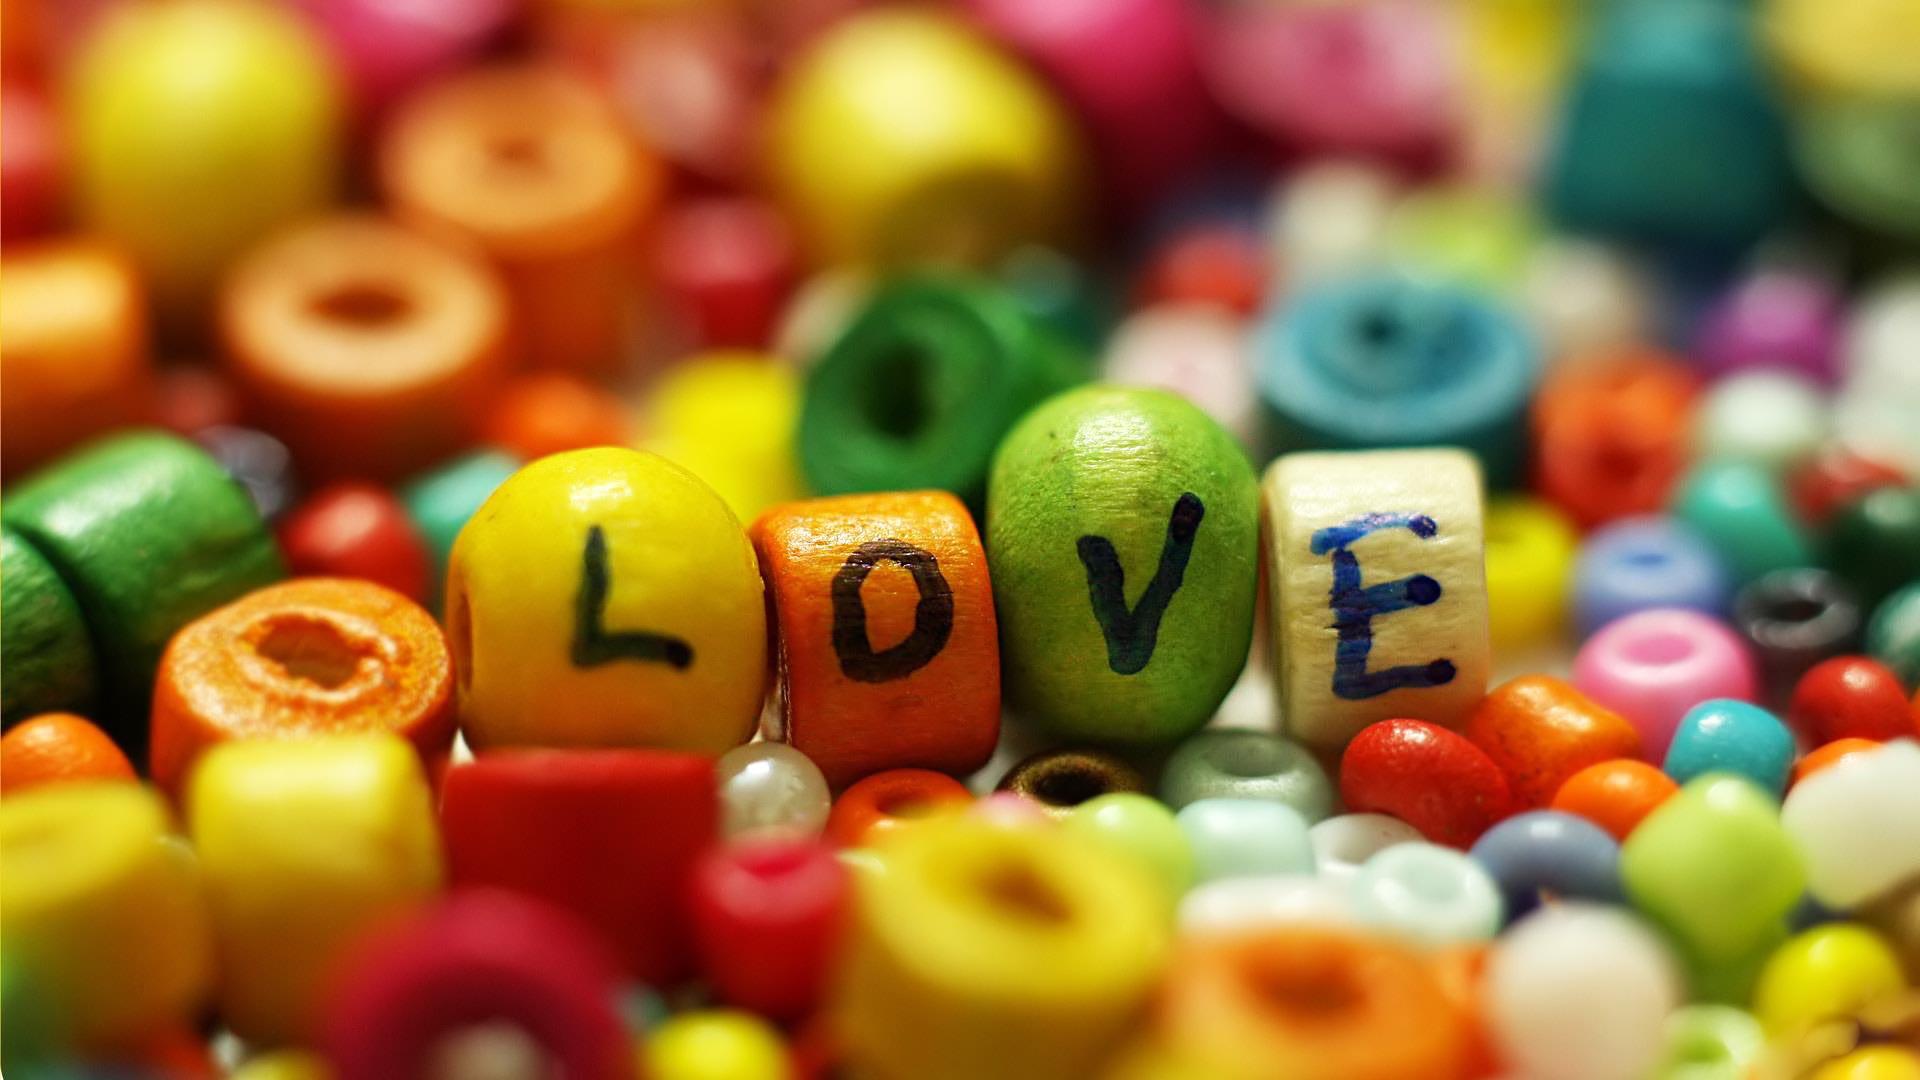 Hd wallpaper of love - Love Hd Wallpapers Love Hd Wallpapers Widescreen Free Love Hd